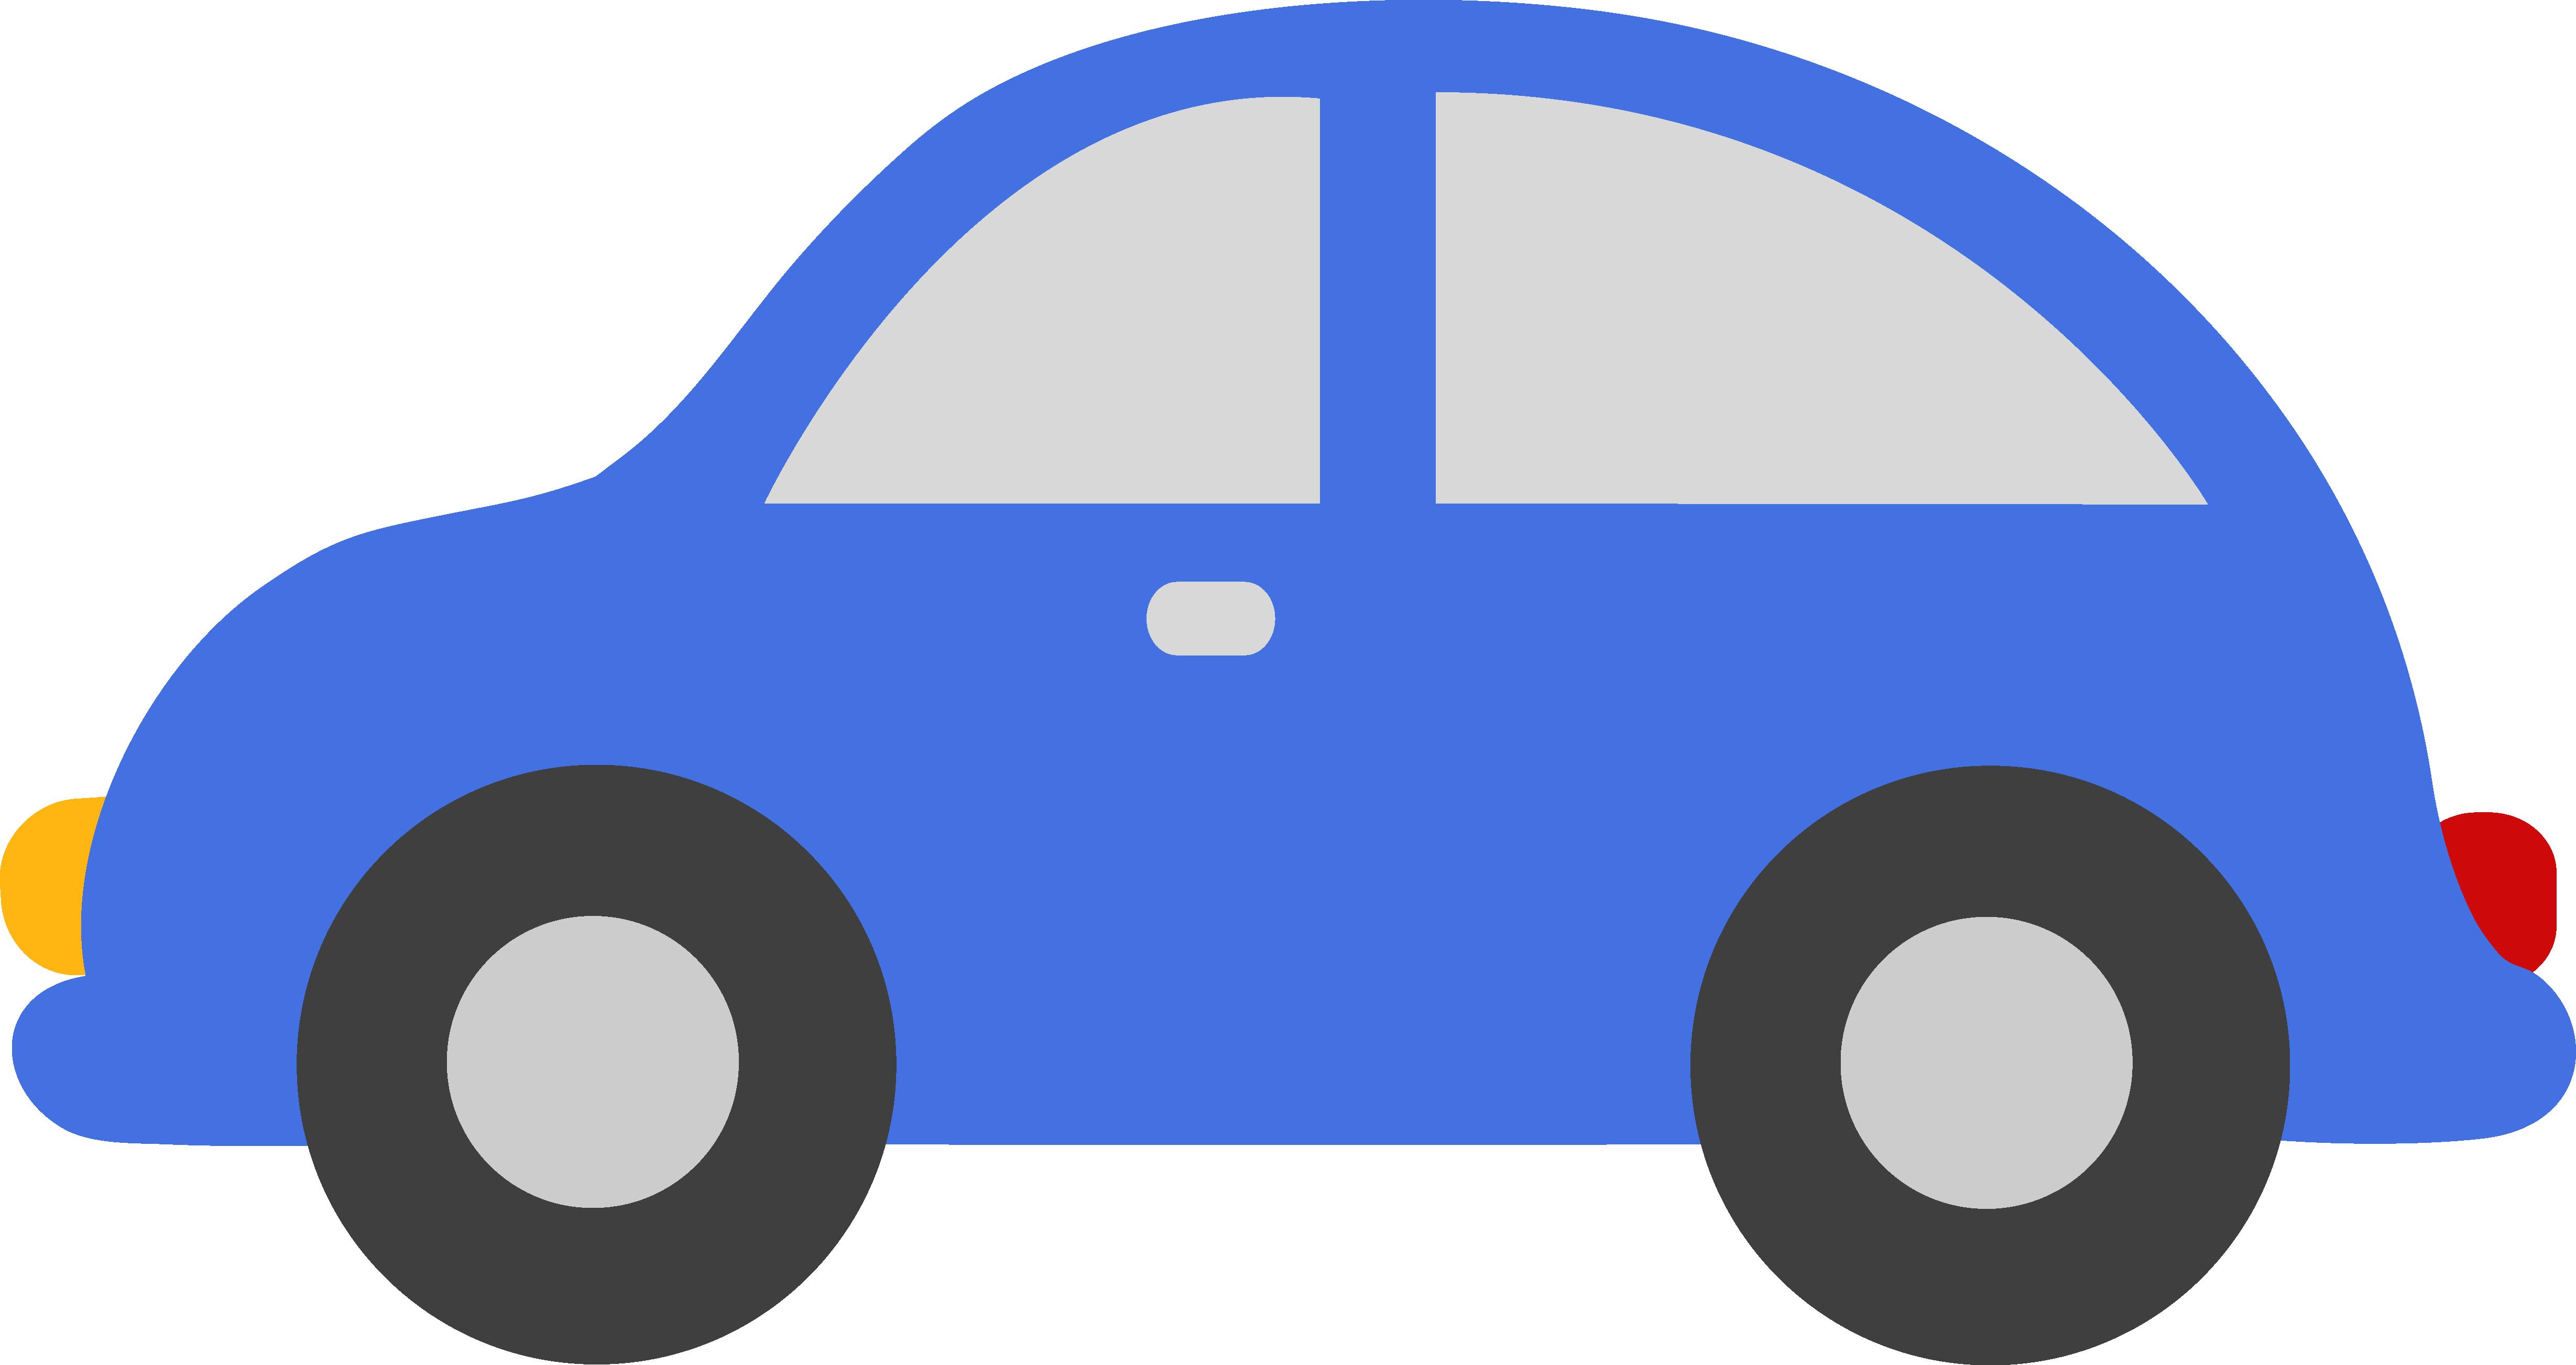 Automobile Clipart | Clipart Panda - Free Clipart Images